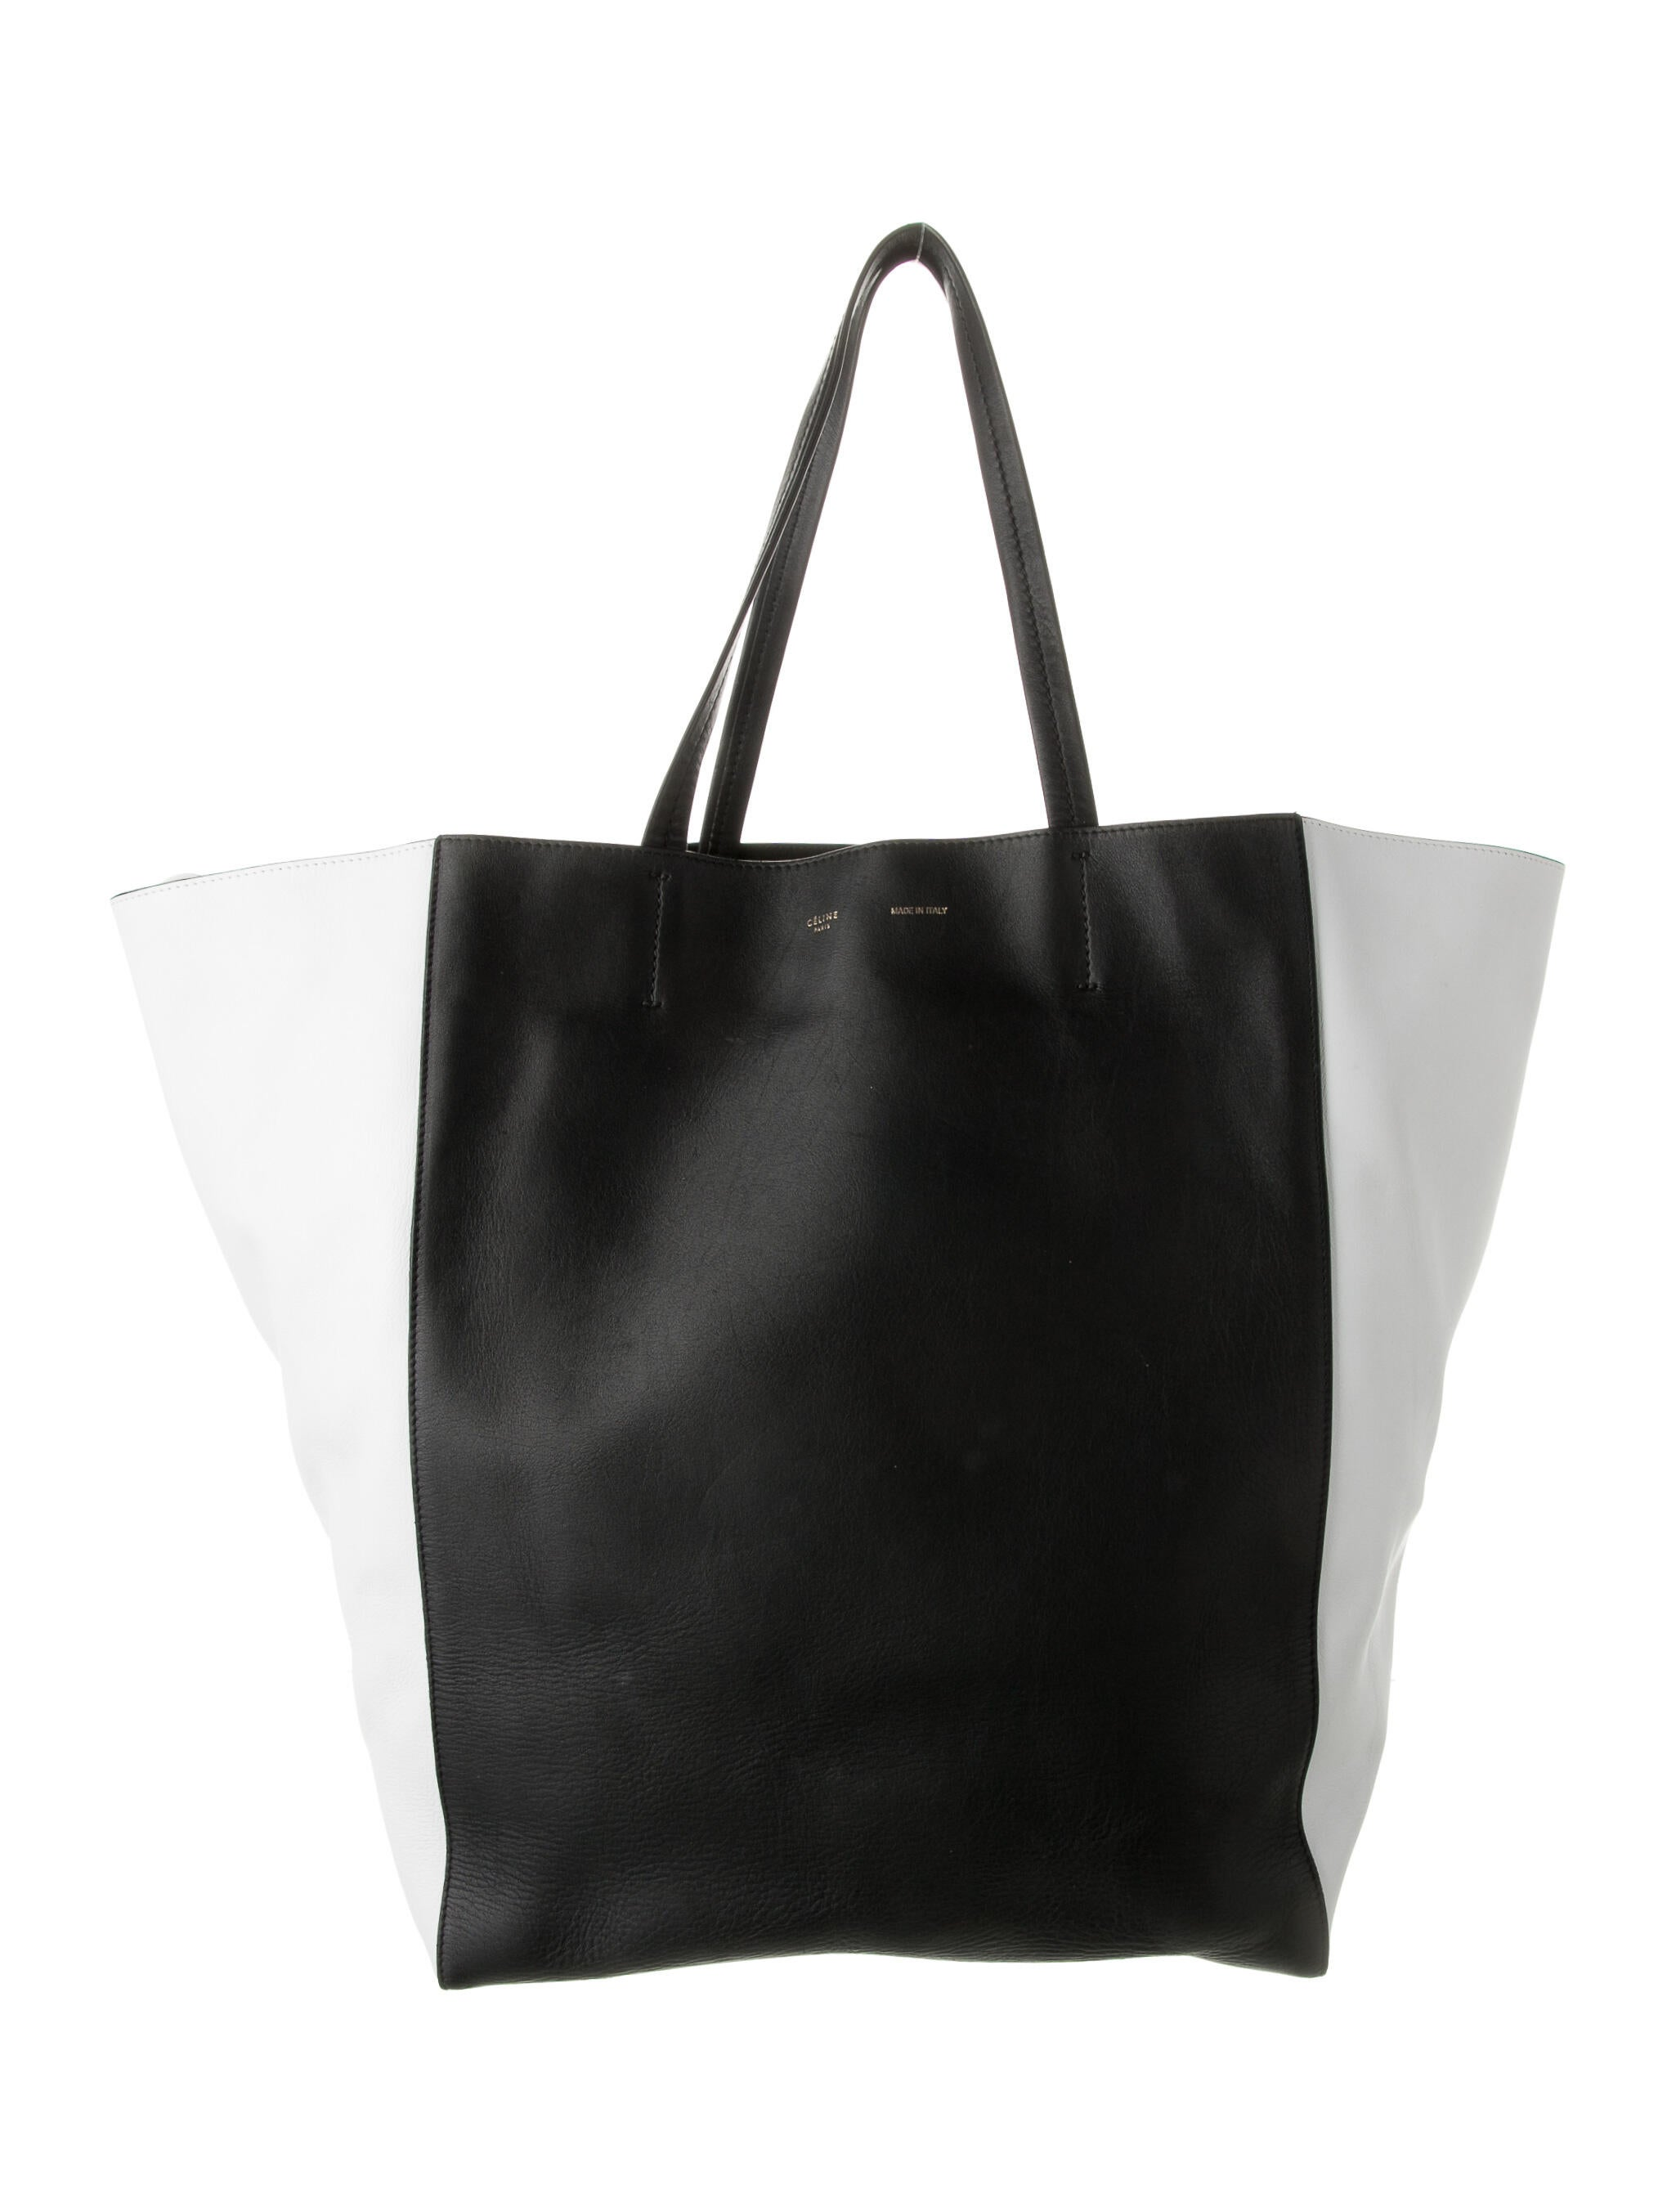 Celine Large Cabas Phantom Tote - Handbags -           CEL137487 | The RealReal